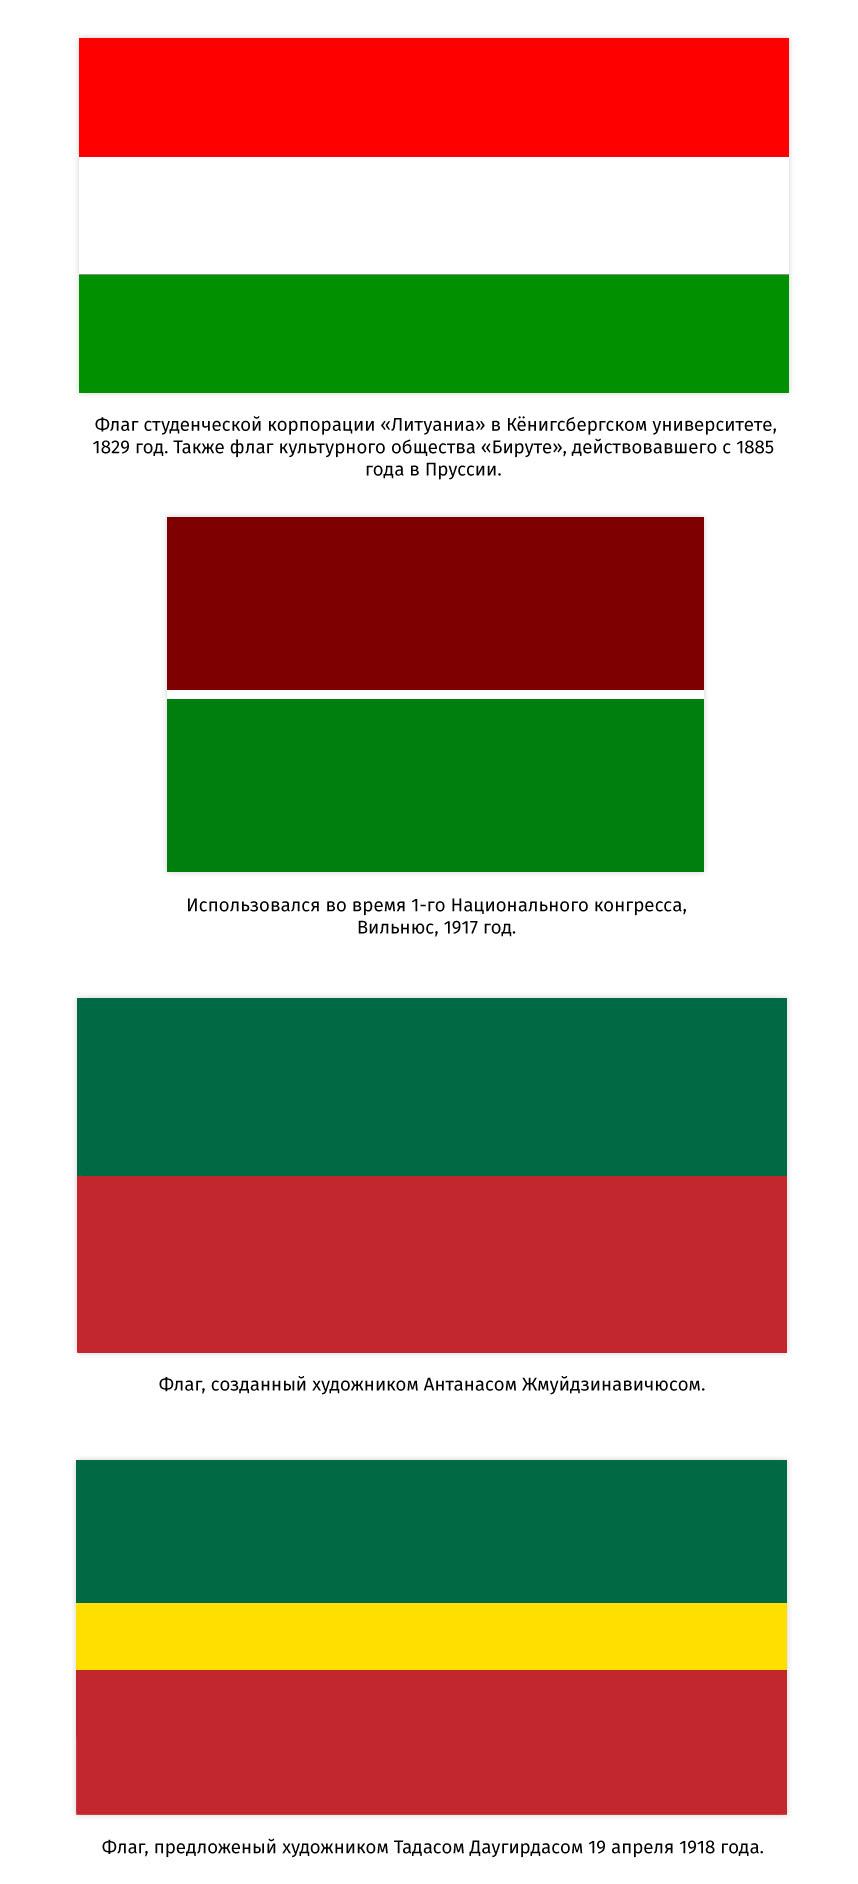 ru69-flag-leetvy-na-puti-stanovleniia-litovskoi-gosudarstvennosti_12